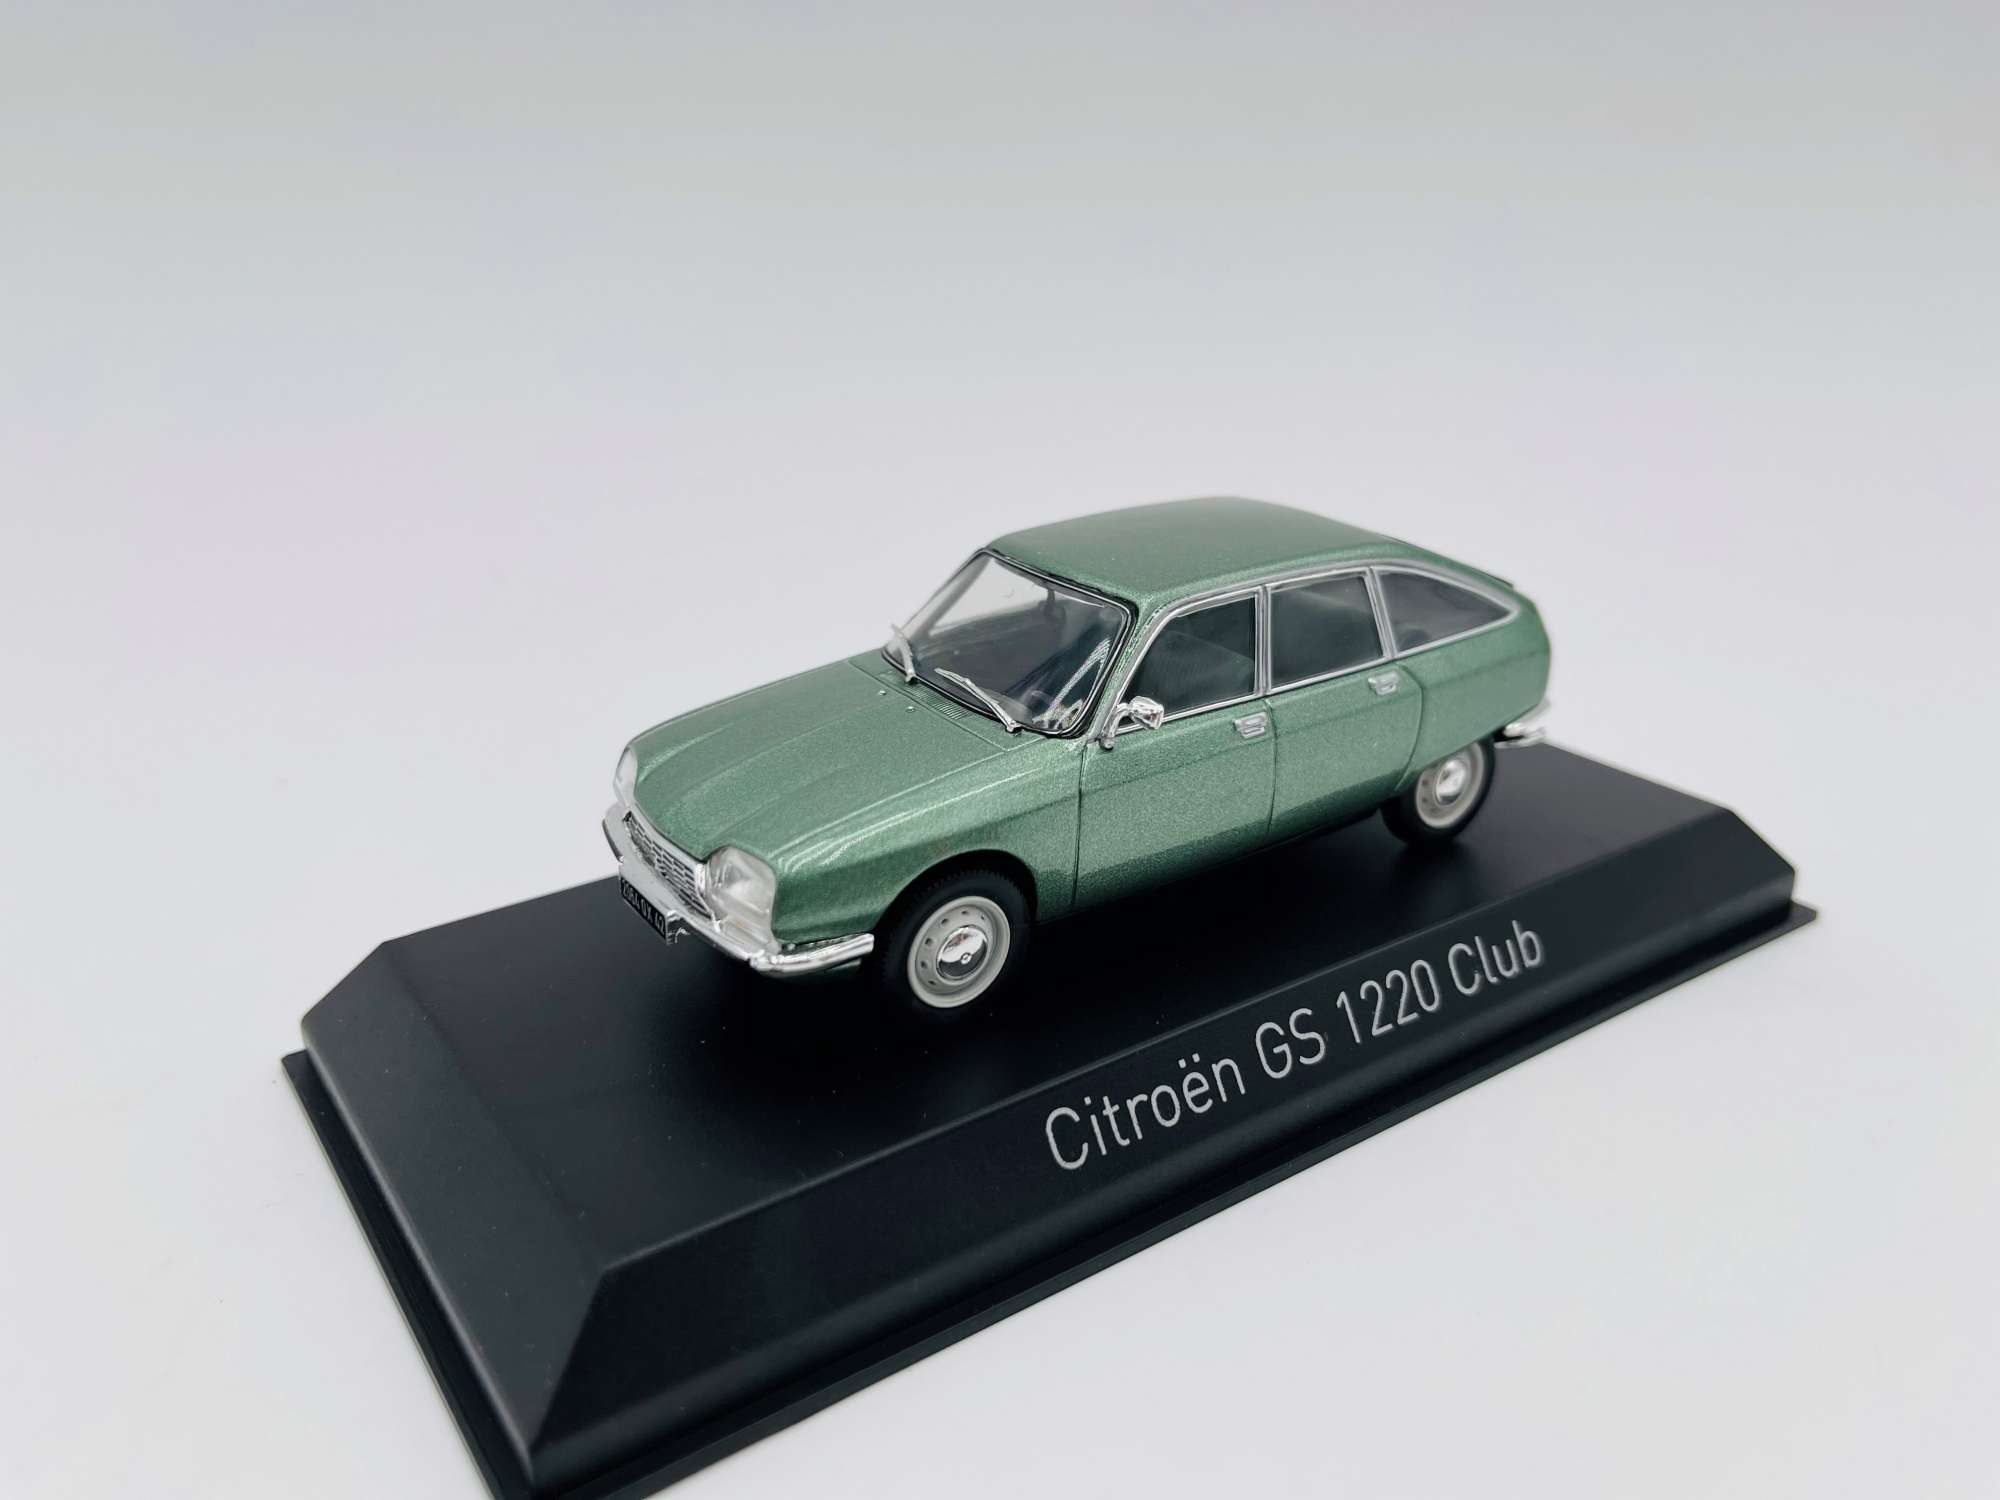 Citroën GS 1200 Club 1973 Silver Green